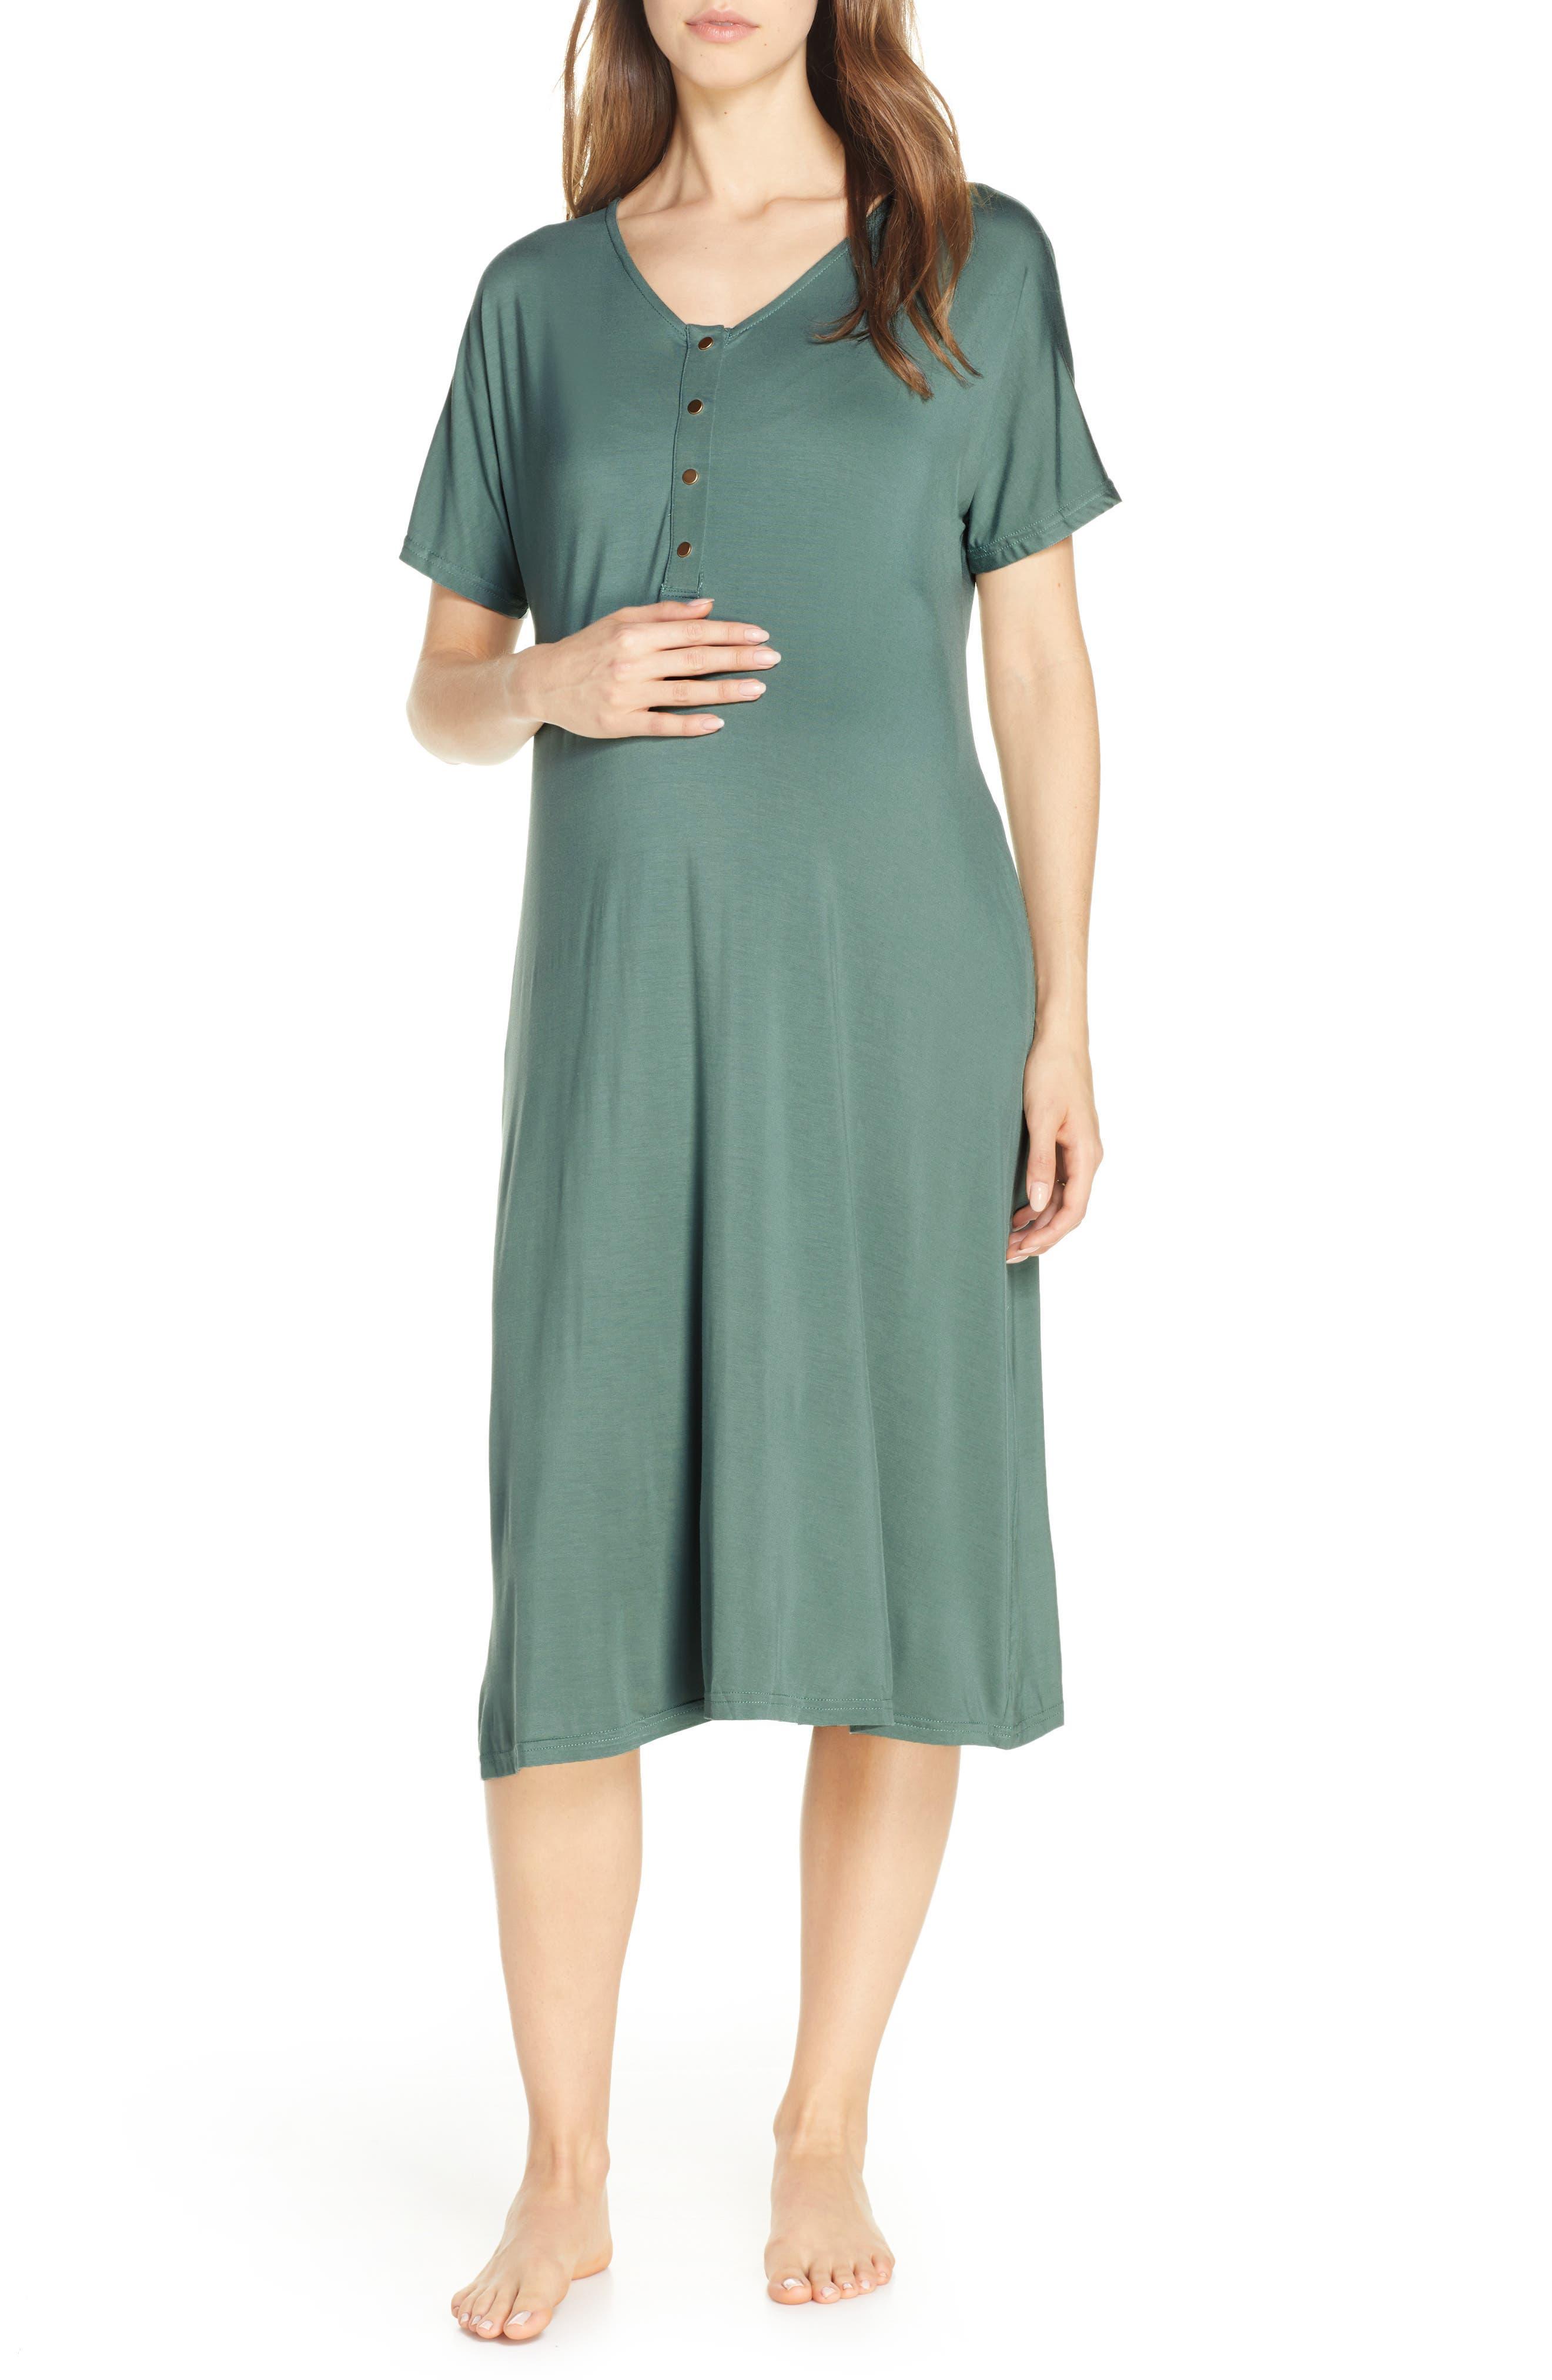 Nesting Olive Solid Maternity/nursing Nightshirt, Blue